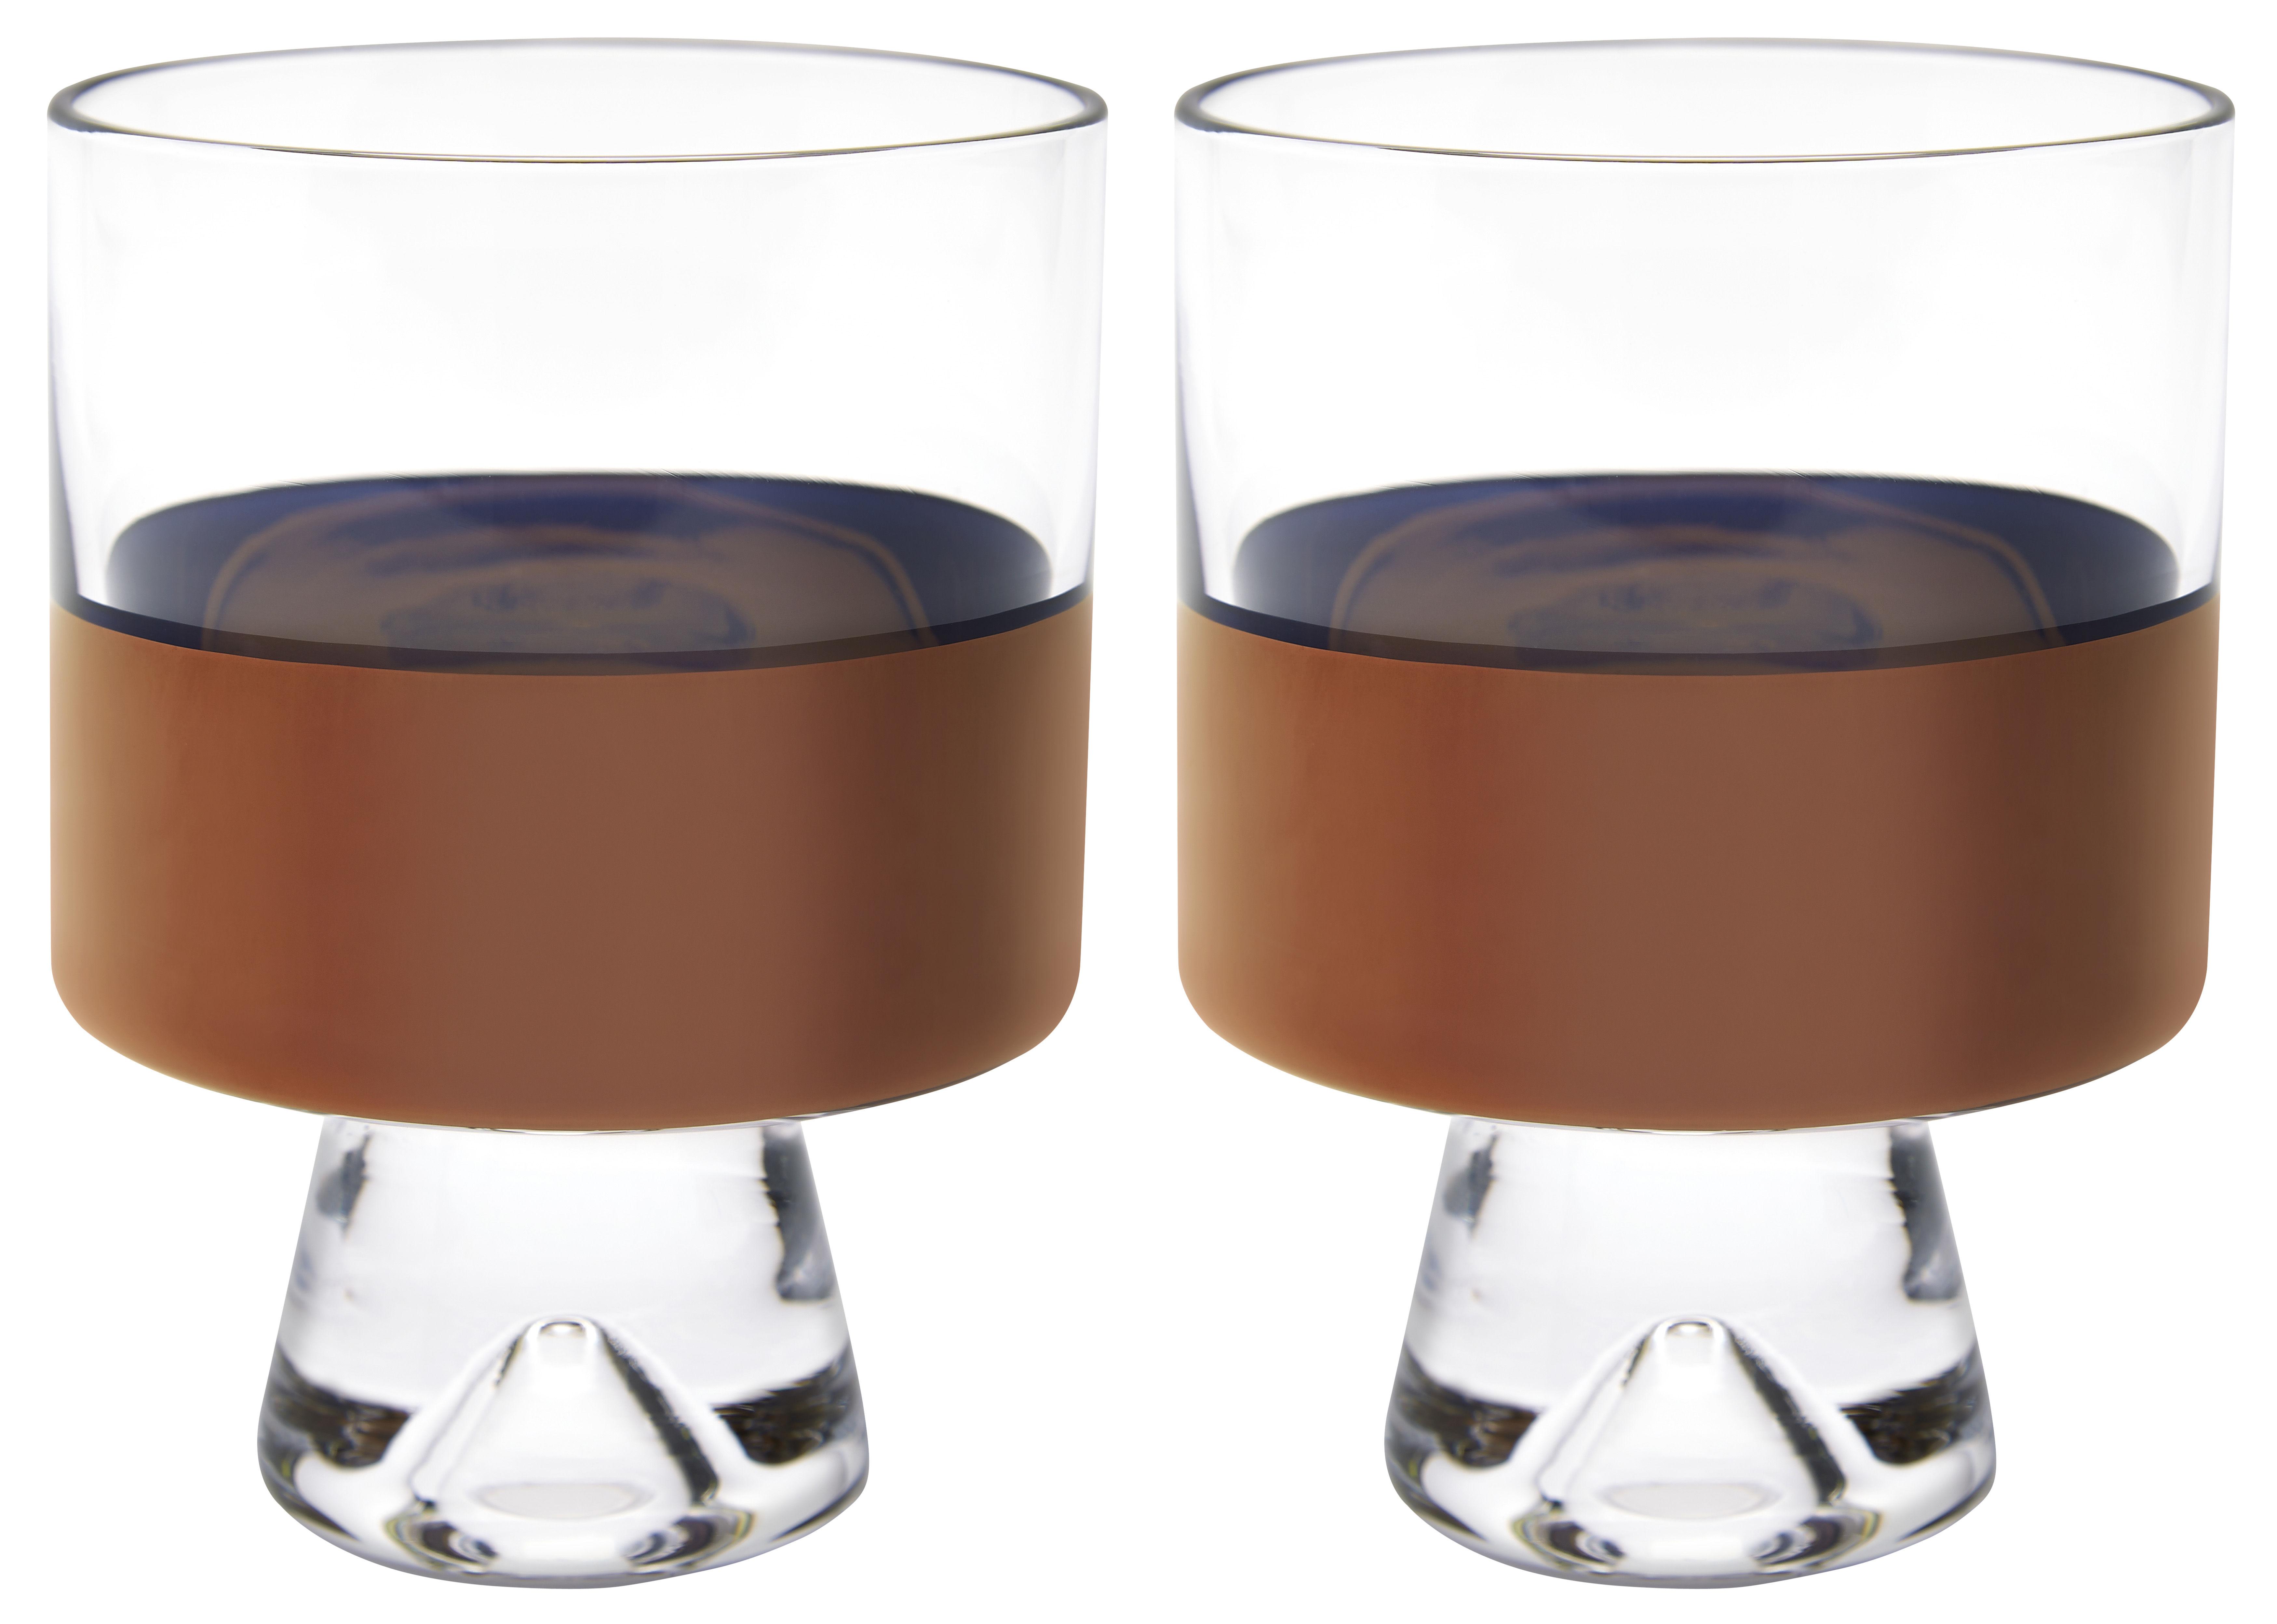 Tavola - Bicchieri  - Bicchiere Tank - / Basso - H 11 cm - Set da 2 di Tom Dixon - Trasparente / Rame - Vetro soffiato a bocca